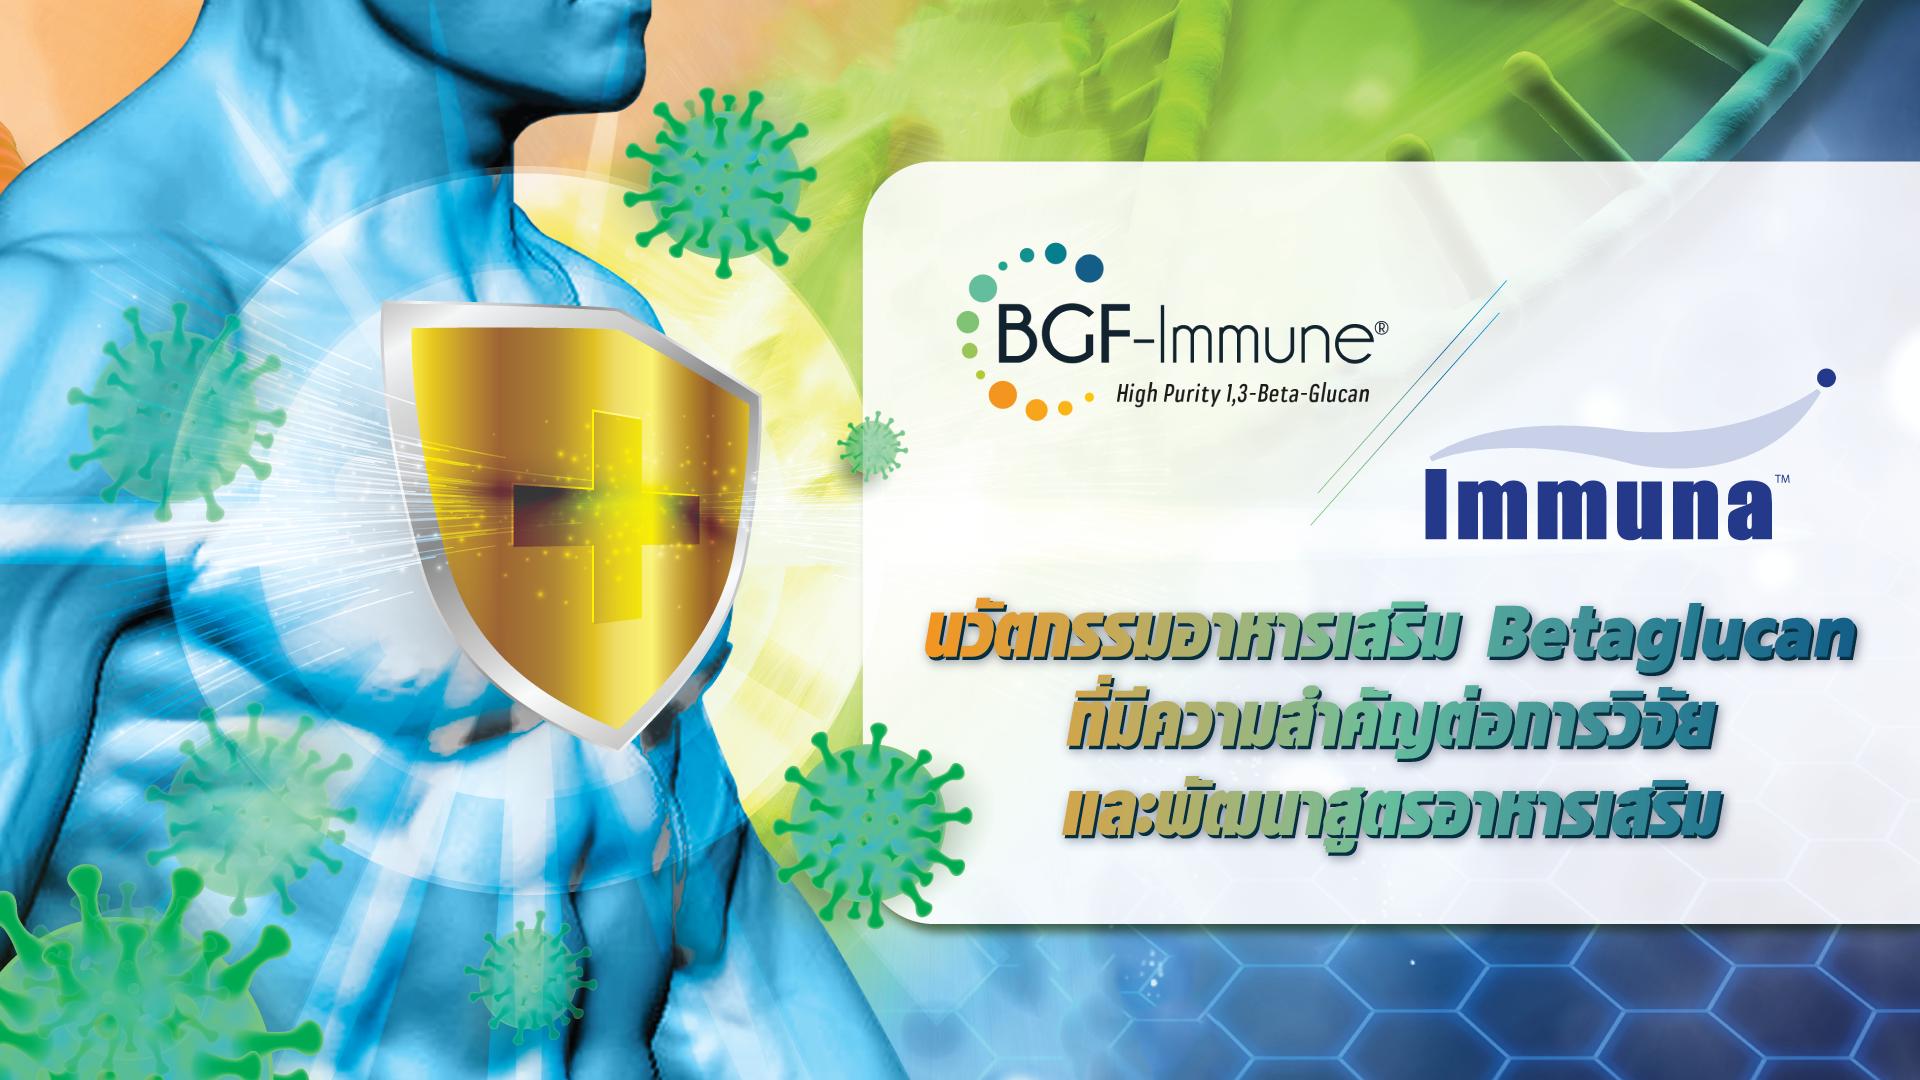 BGF immune & immuna นวัตกรรมอาหารเสริม beta glucan ที่มีความสำคัญต่อการวิจัยและพัฒนาสูตรอาหารเสริมภูมิคุ้มกัน